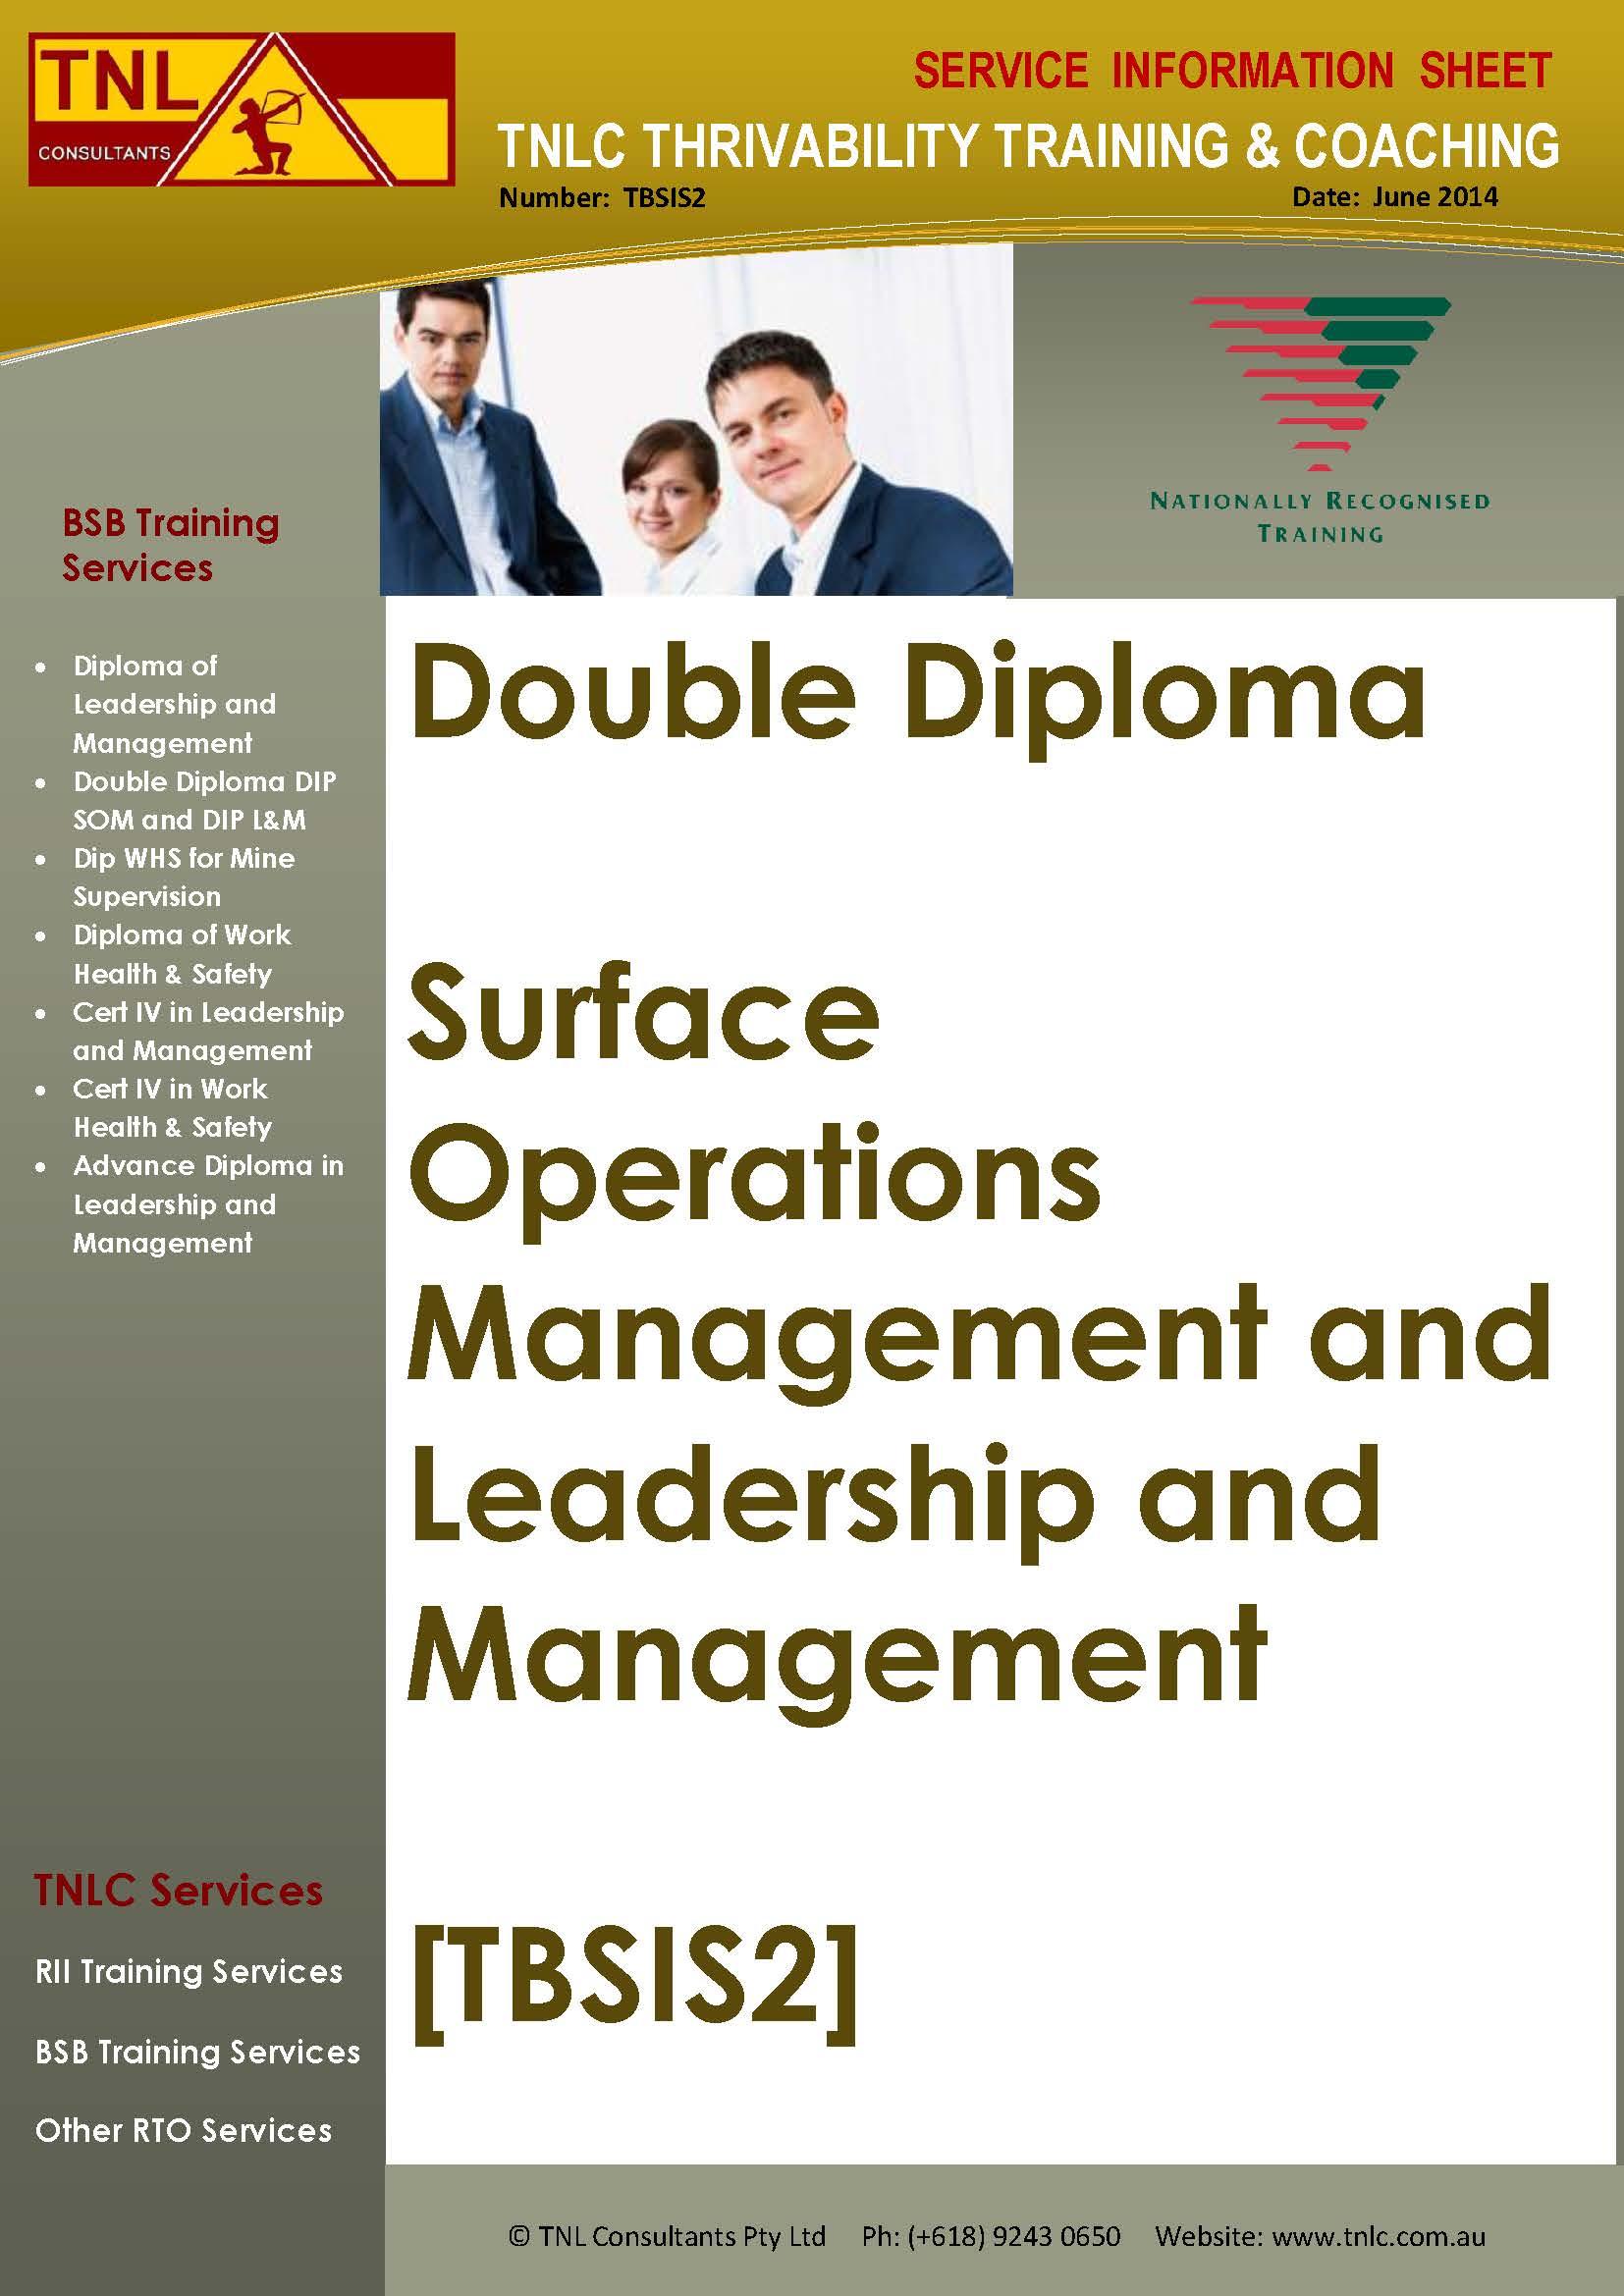 TBSIS2 Double Diploma Sept 2015IMAGEv1